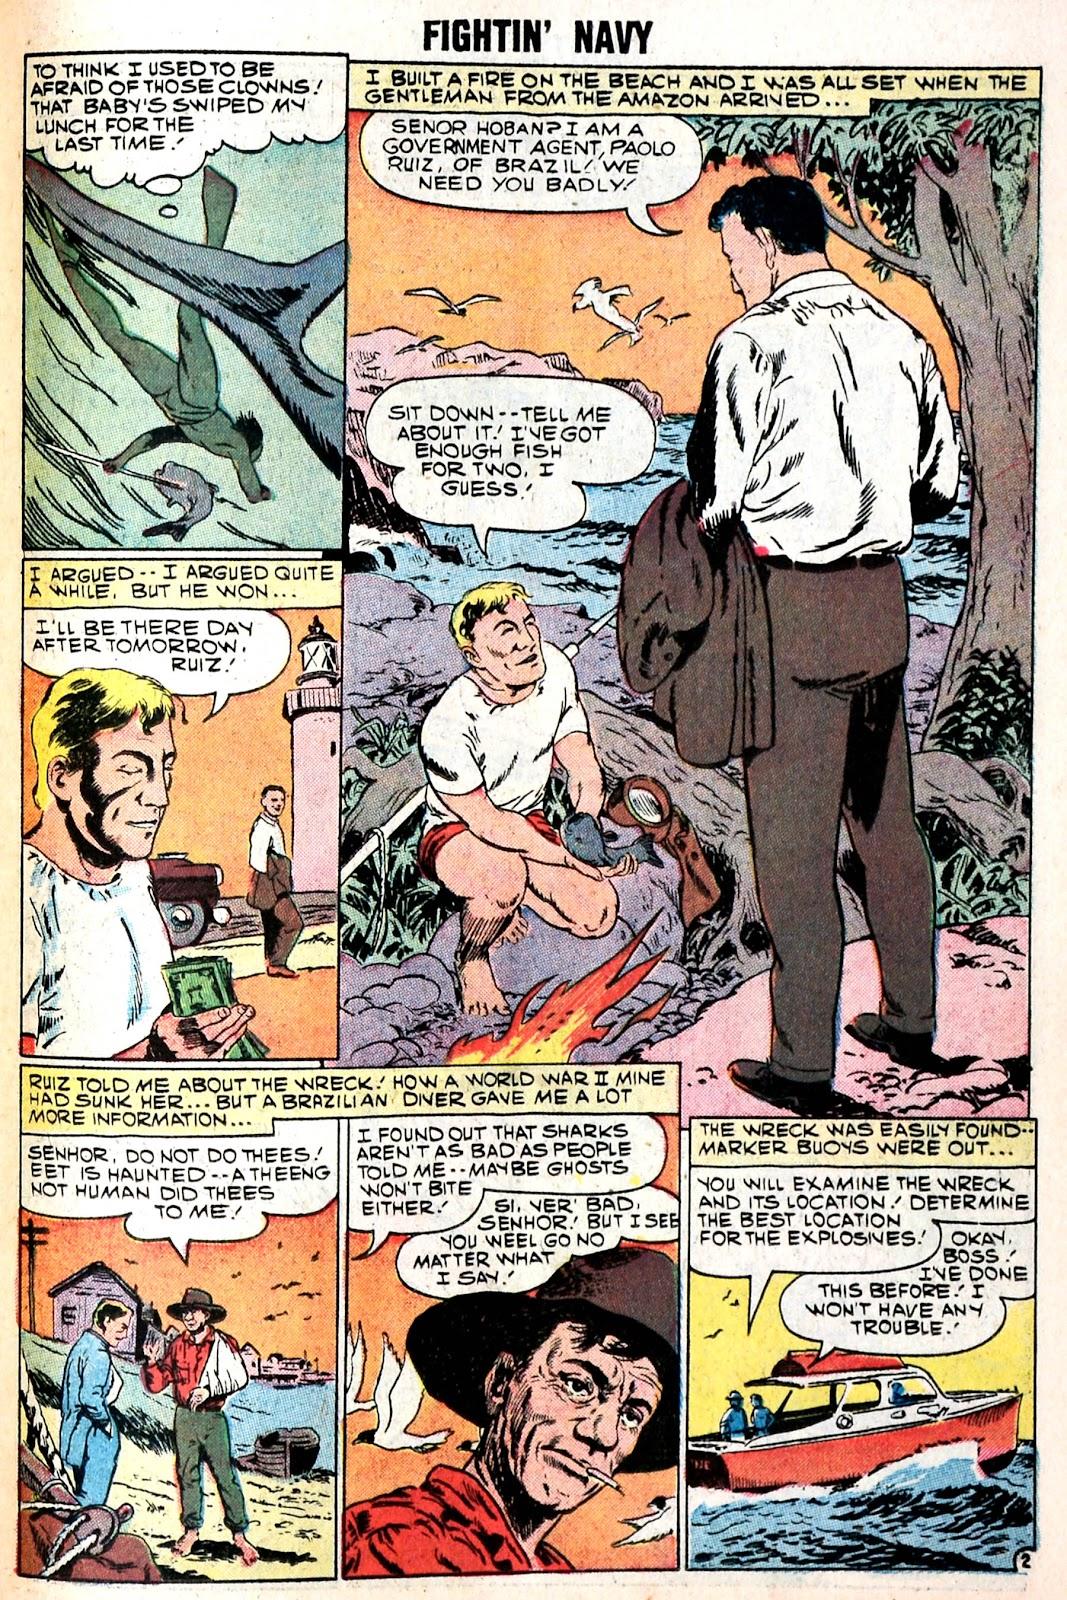 Read online Fightin' Navy comic -  Issue #85 - 23